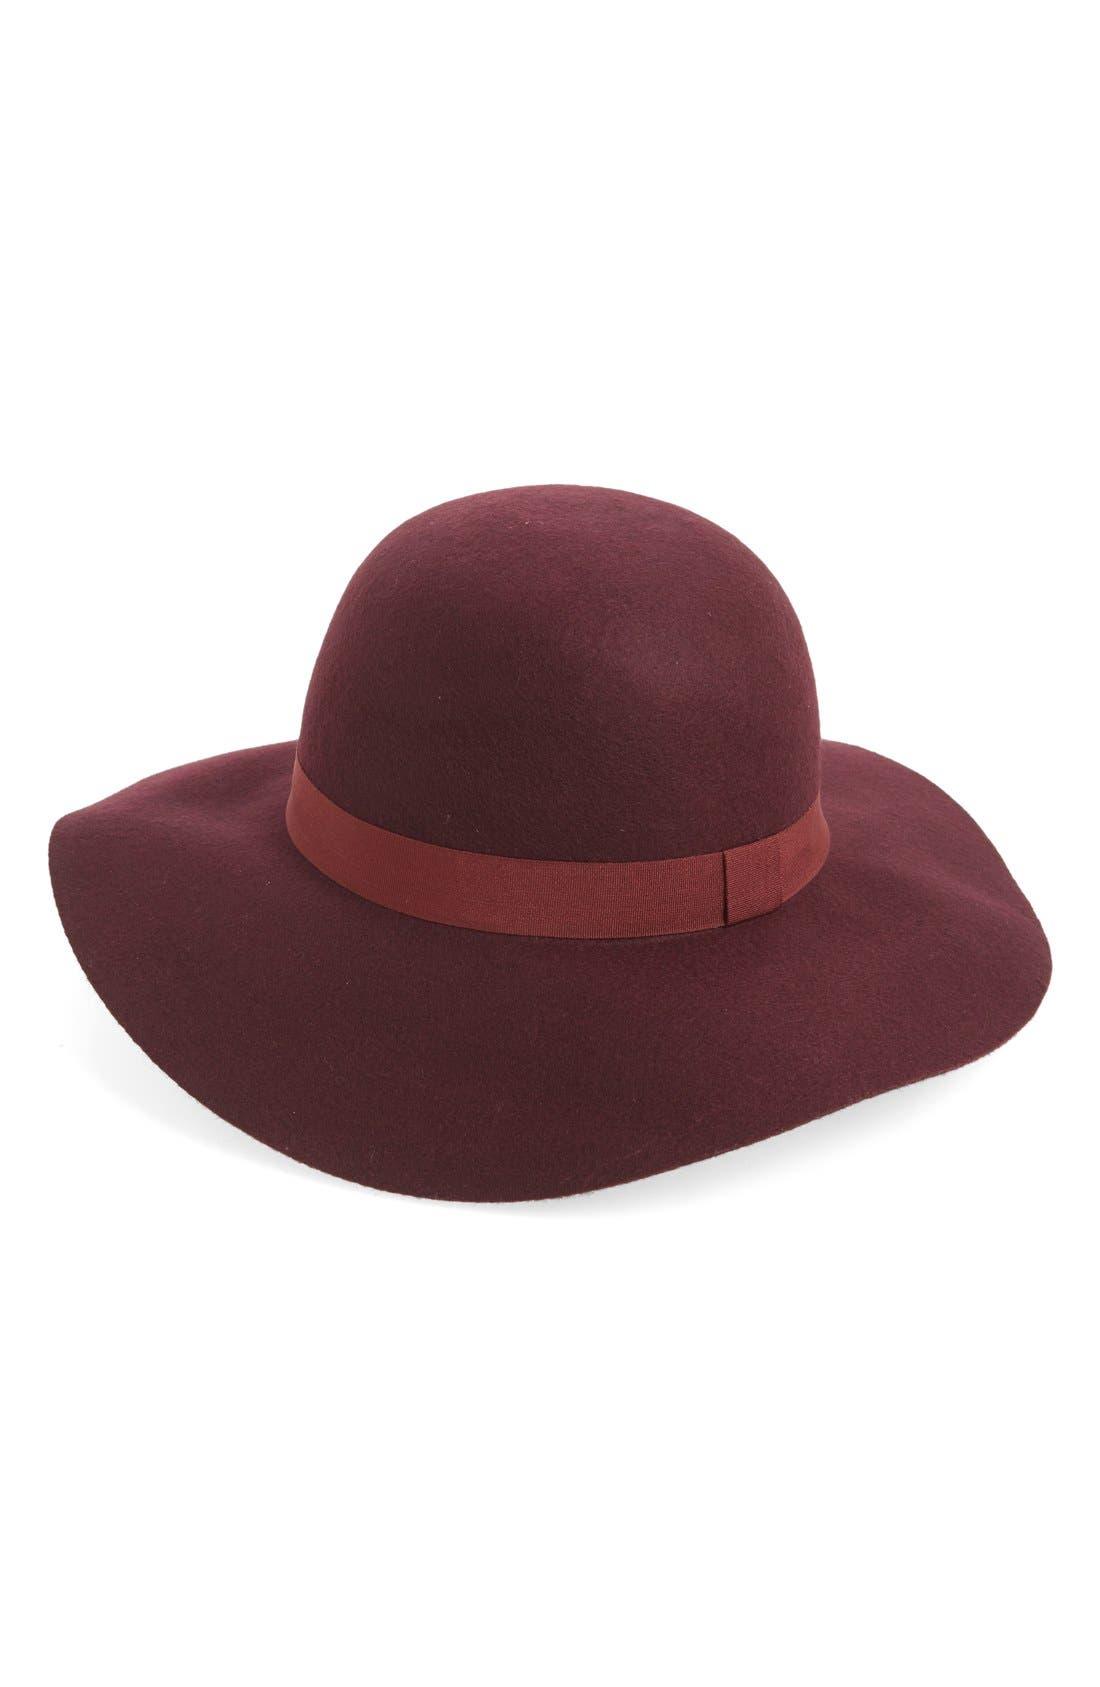 Ribbon Trim Felt Floppy Hat,                             Main thumbnail 1, color,                             Burgundy